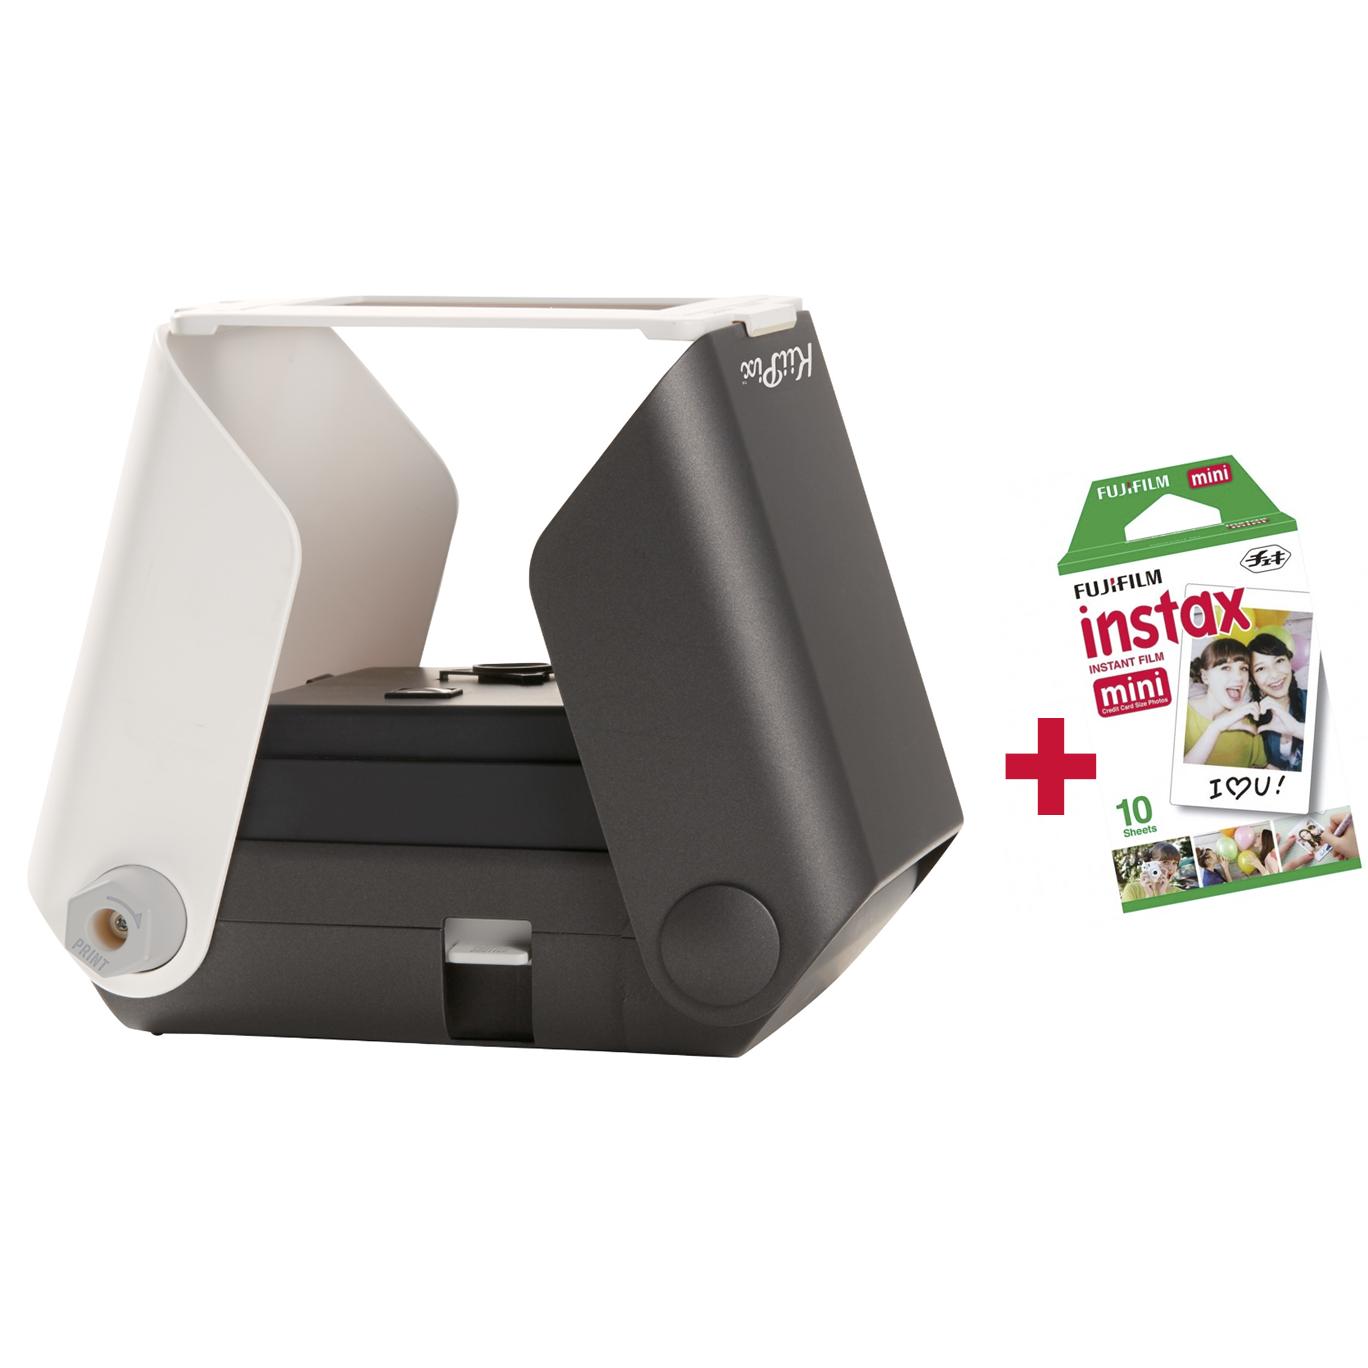 KiiPix SmartPhone Printer Instax Bundle - Jet Black - Shrink Wrap